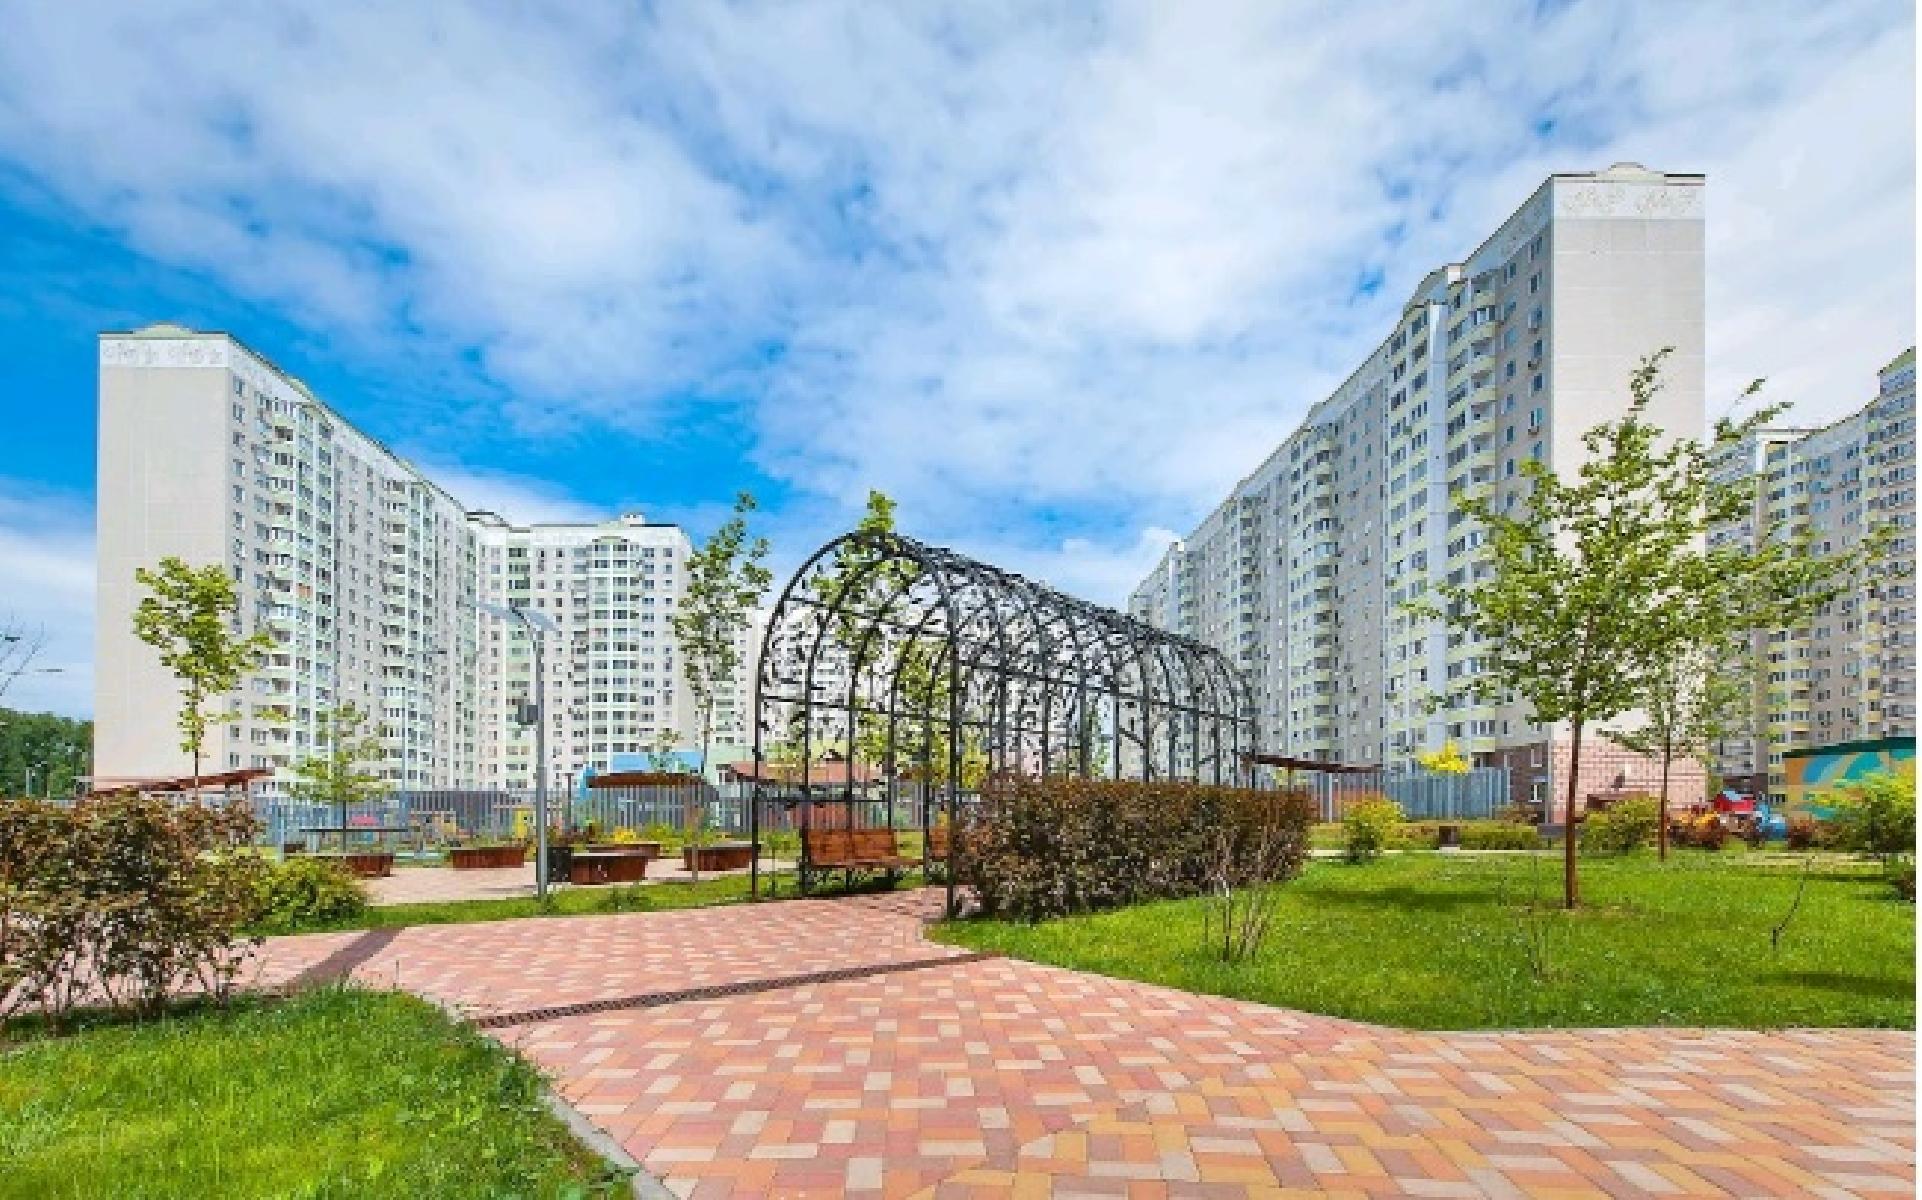 Фото №2 - 1-комнатная квартира, Москва, город Московский, Никитина улица 11 корпус 5, метро Филатов луг